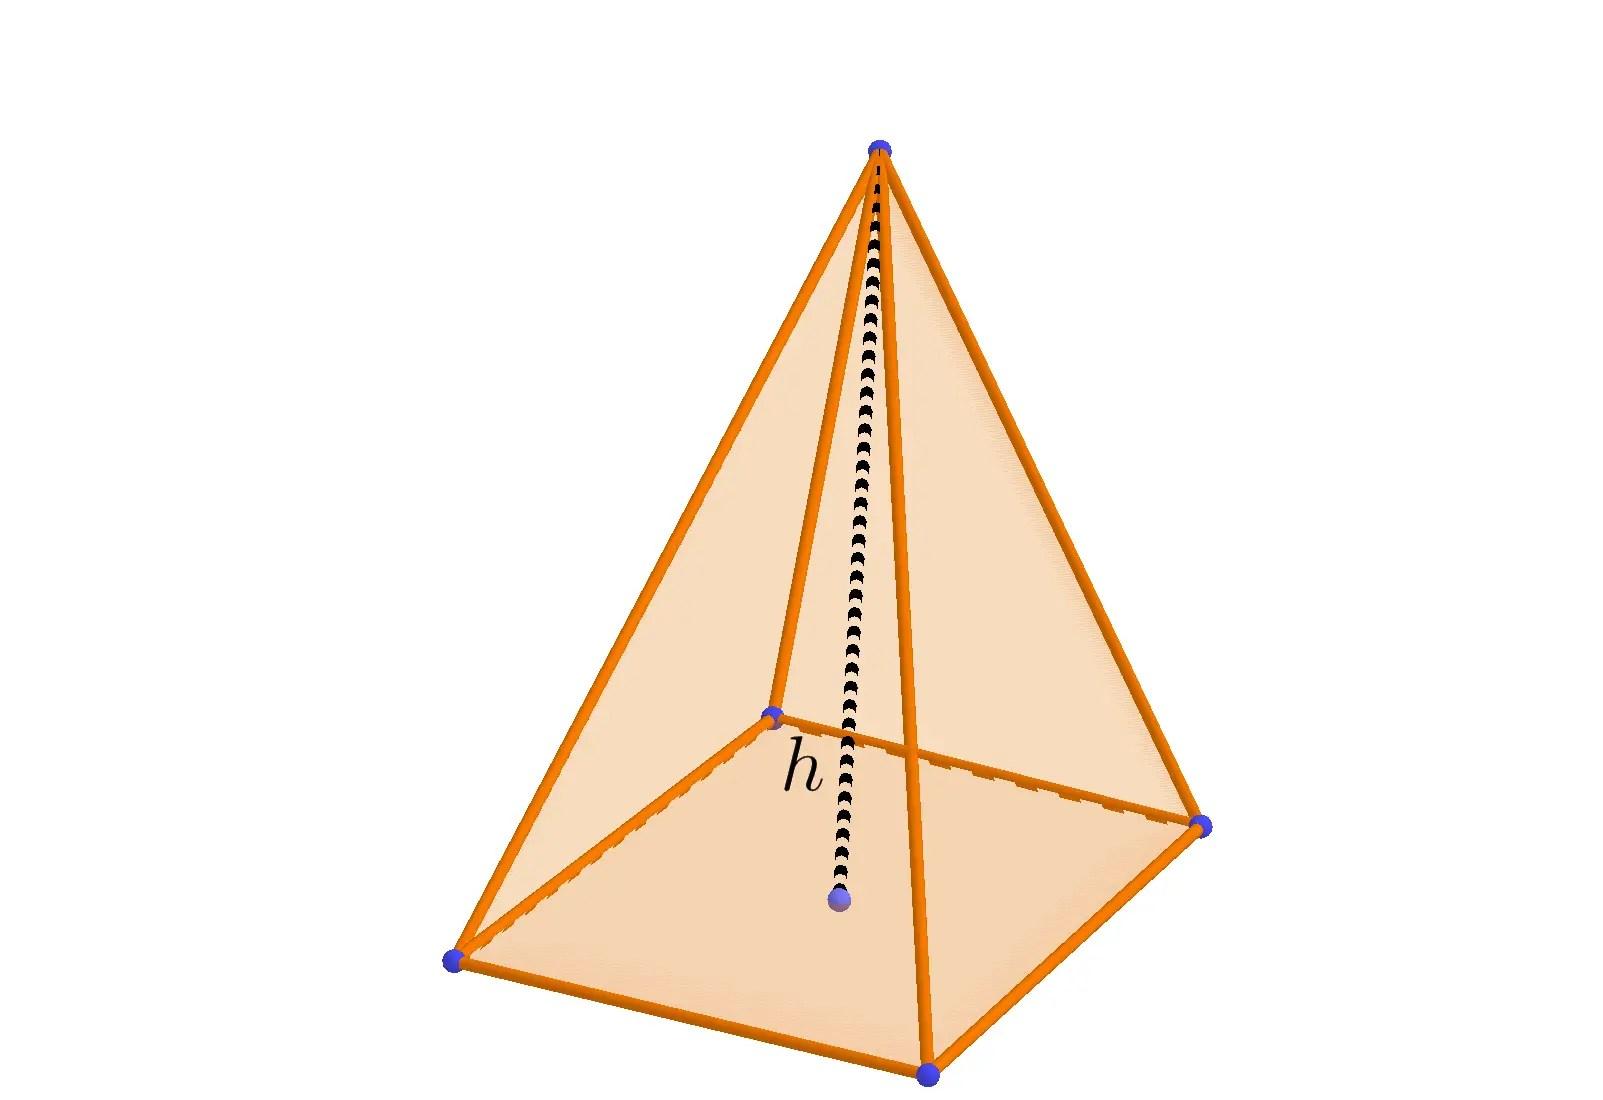 Geometry Formulas Reference